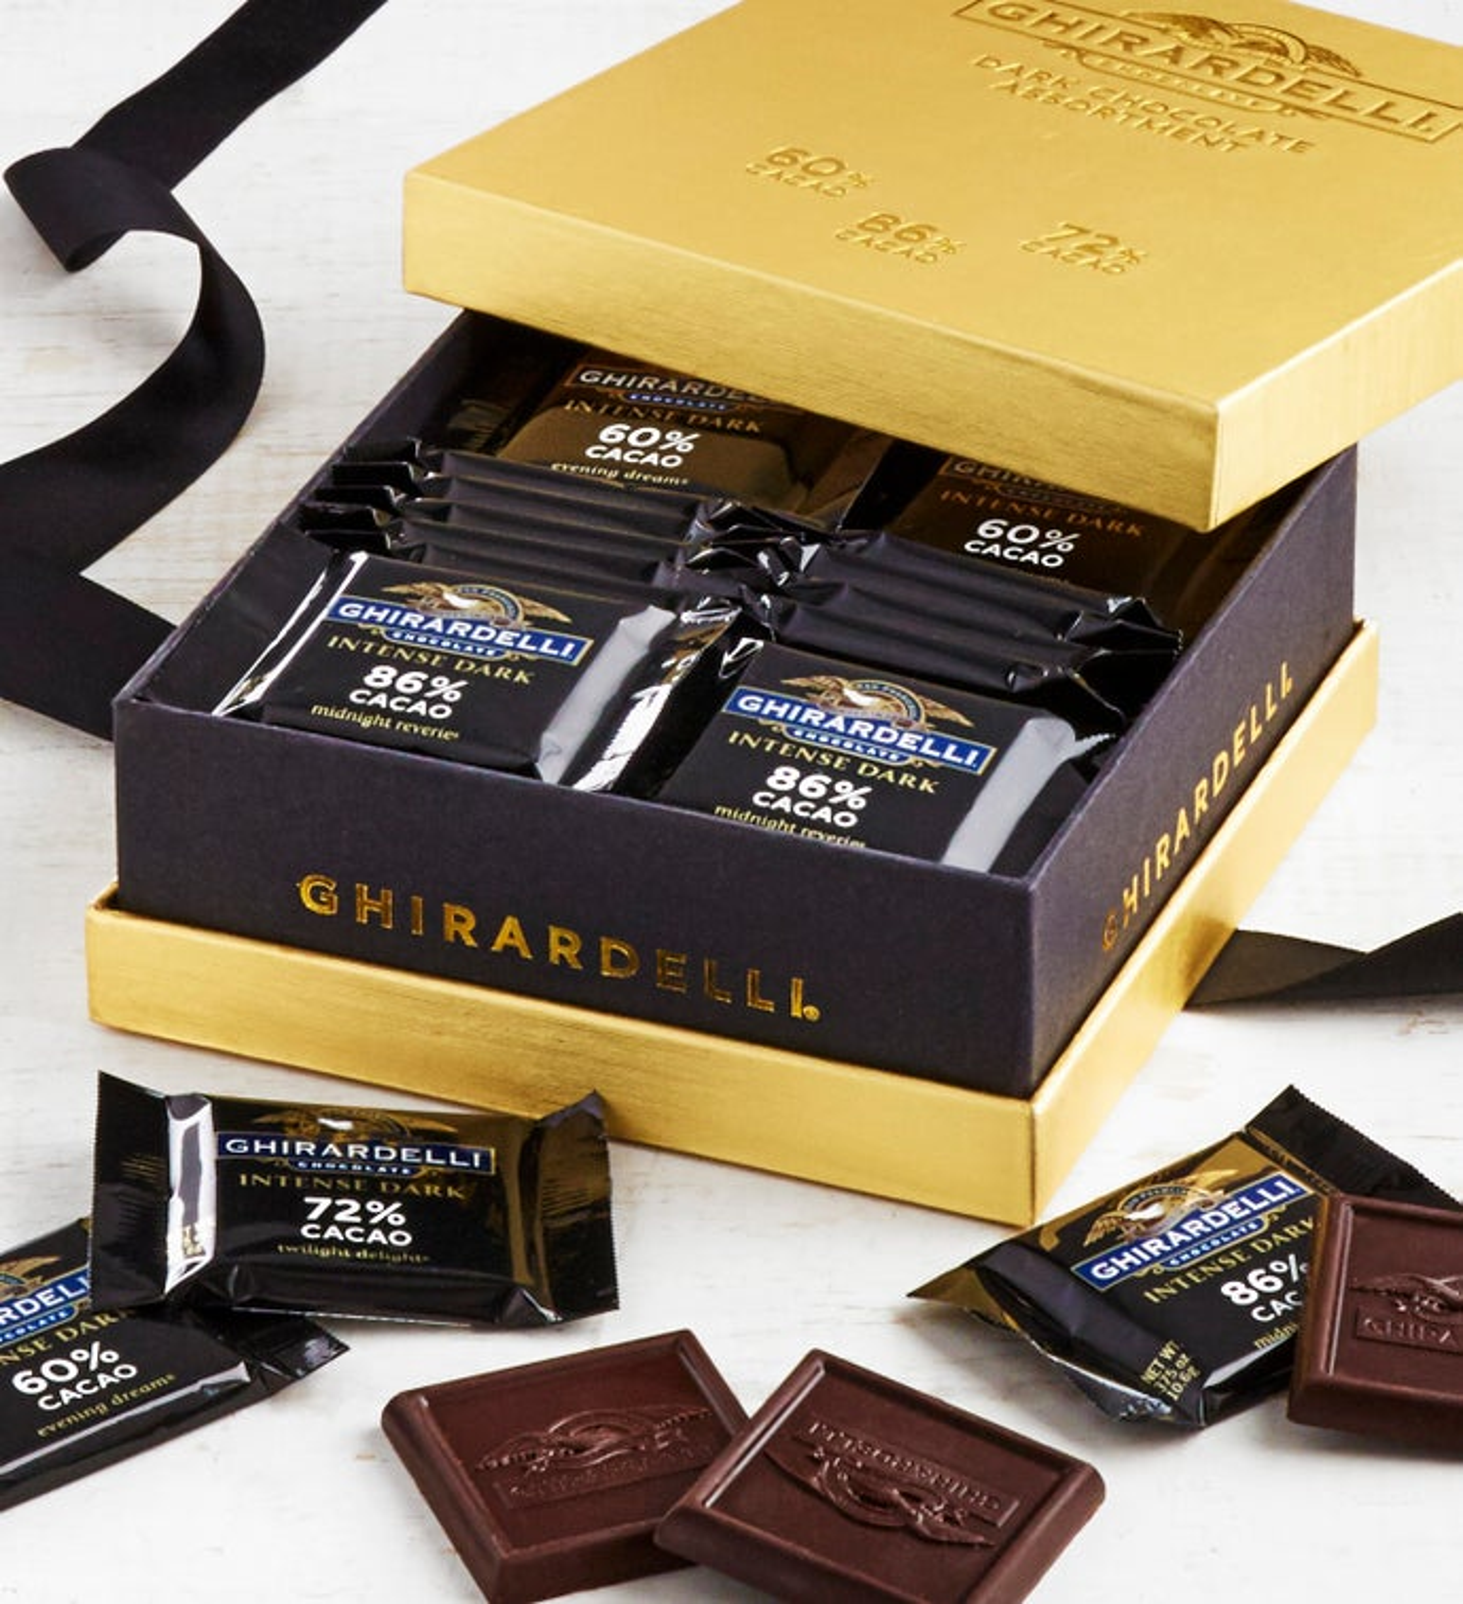 Ghirardelli Intense Dark Chocolate Gold Box pc